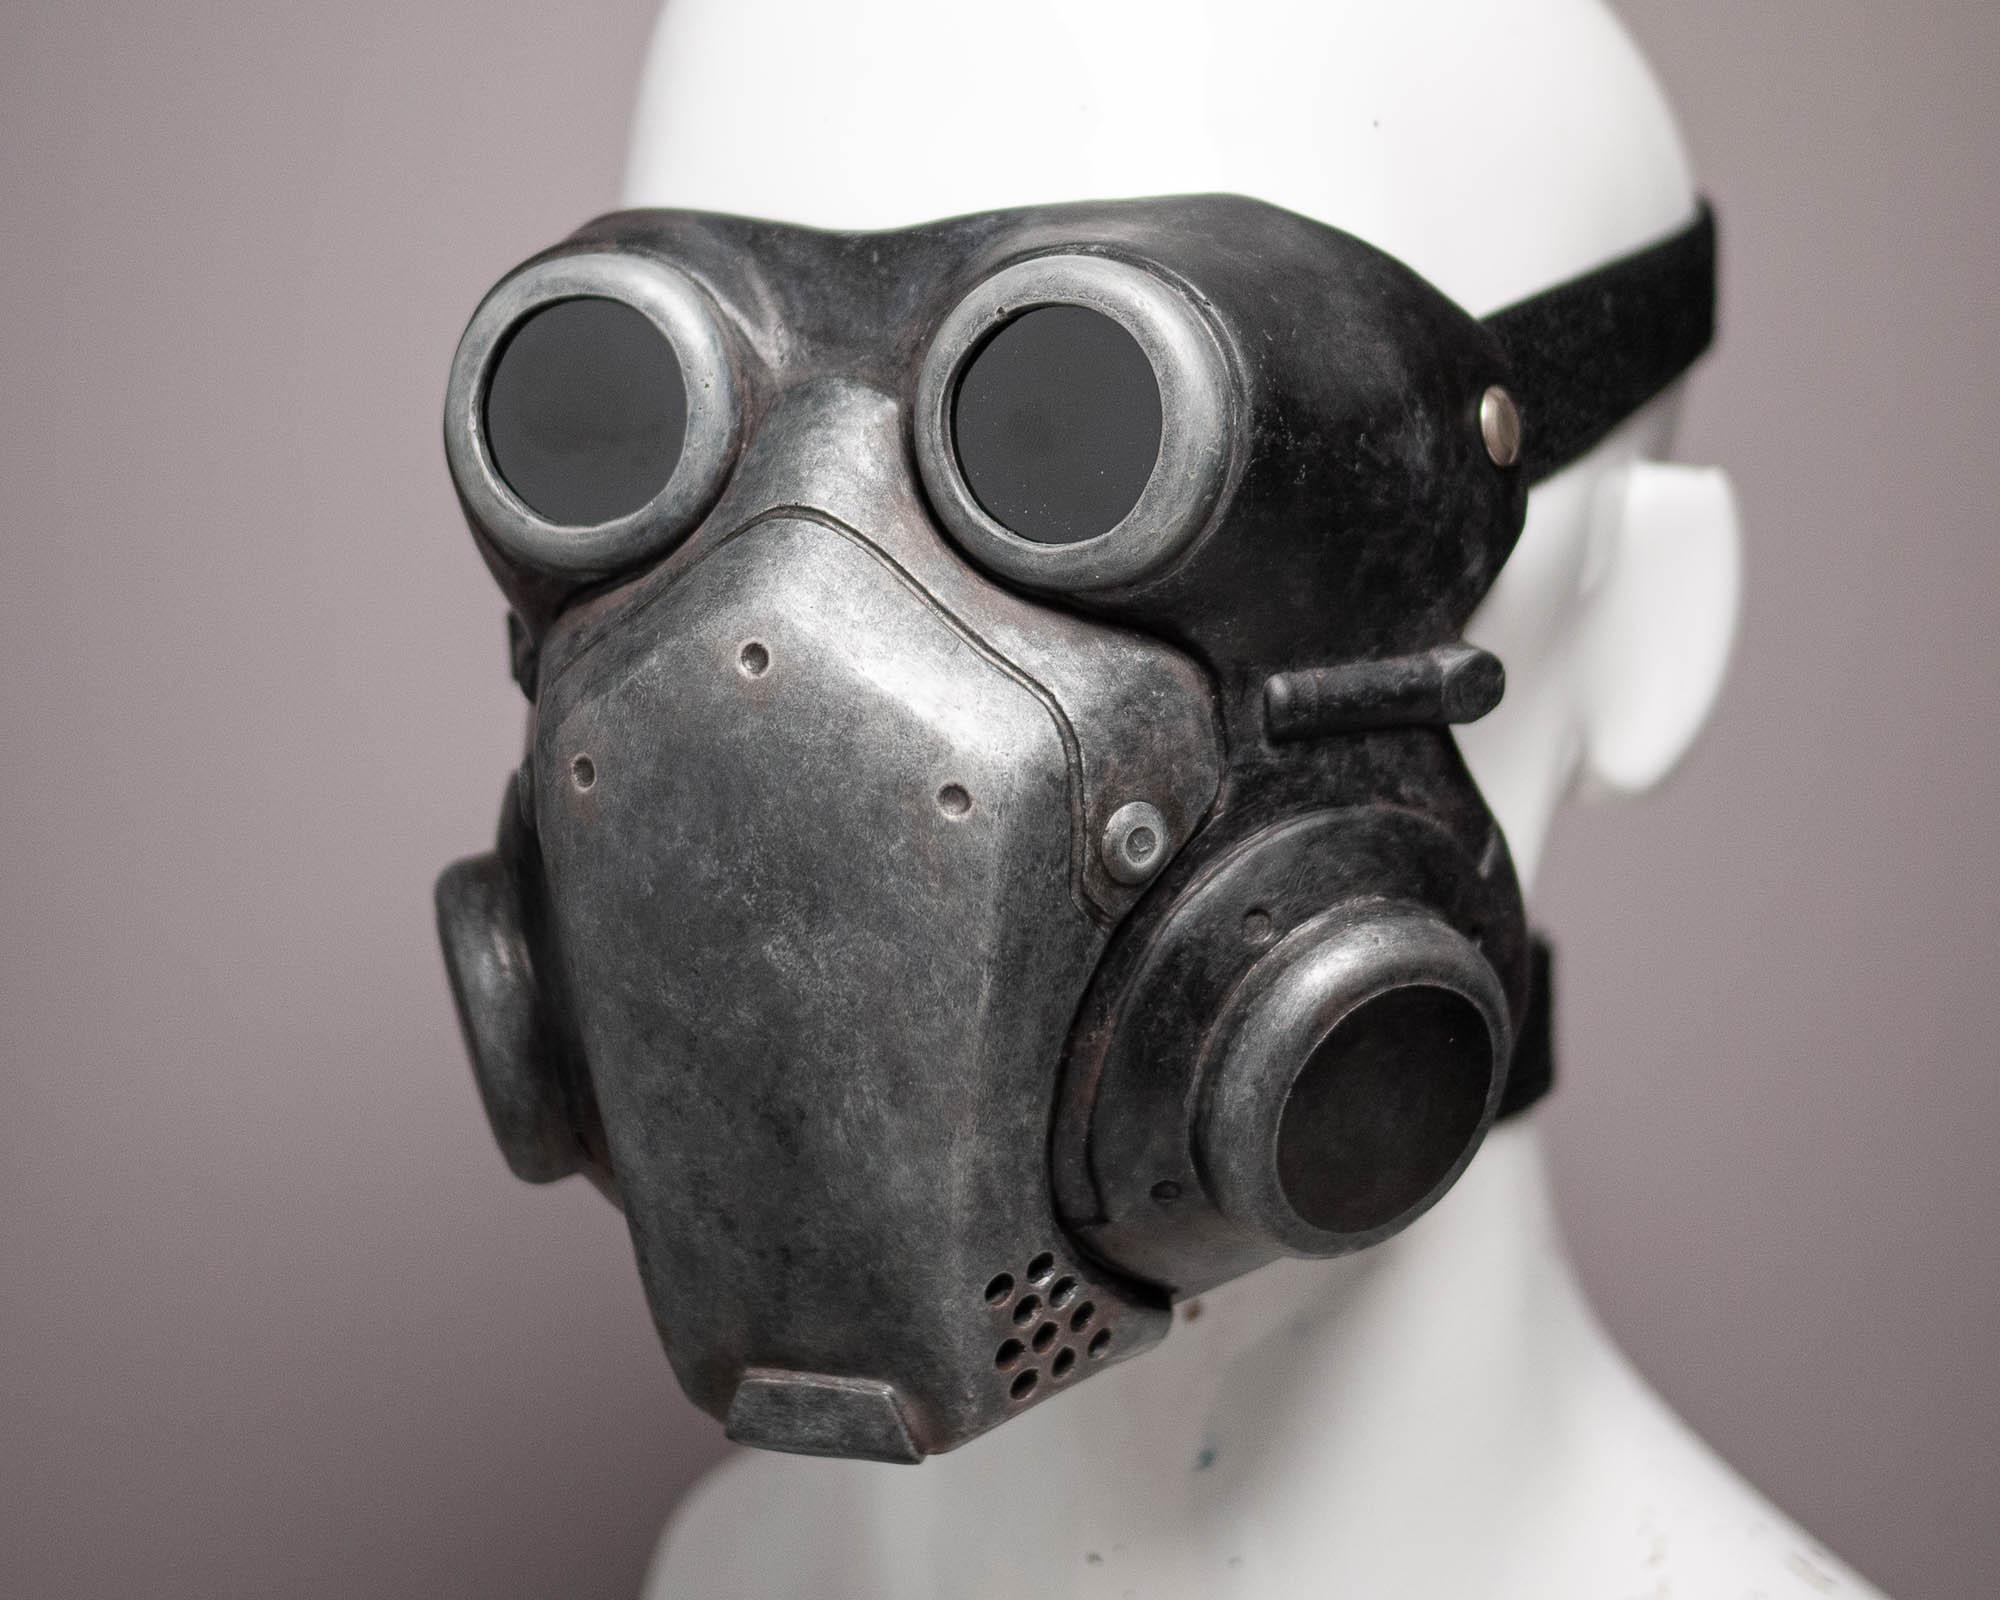 modulus-props-cyberpunk-mask-2.jpg